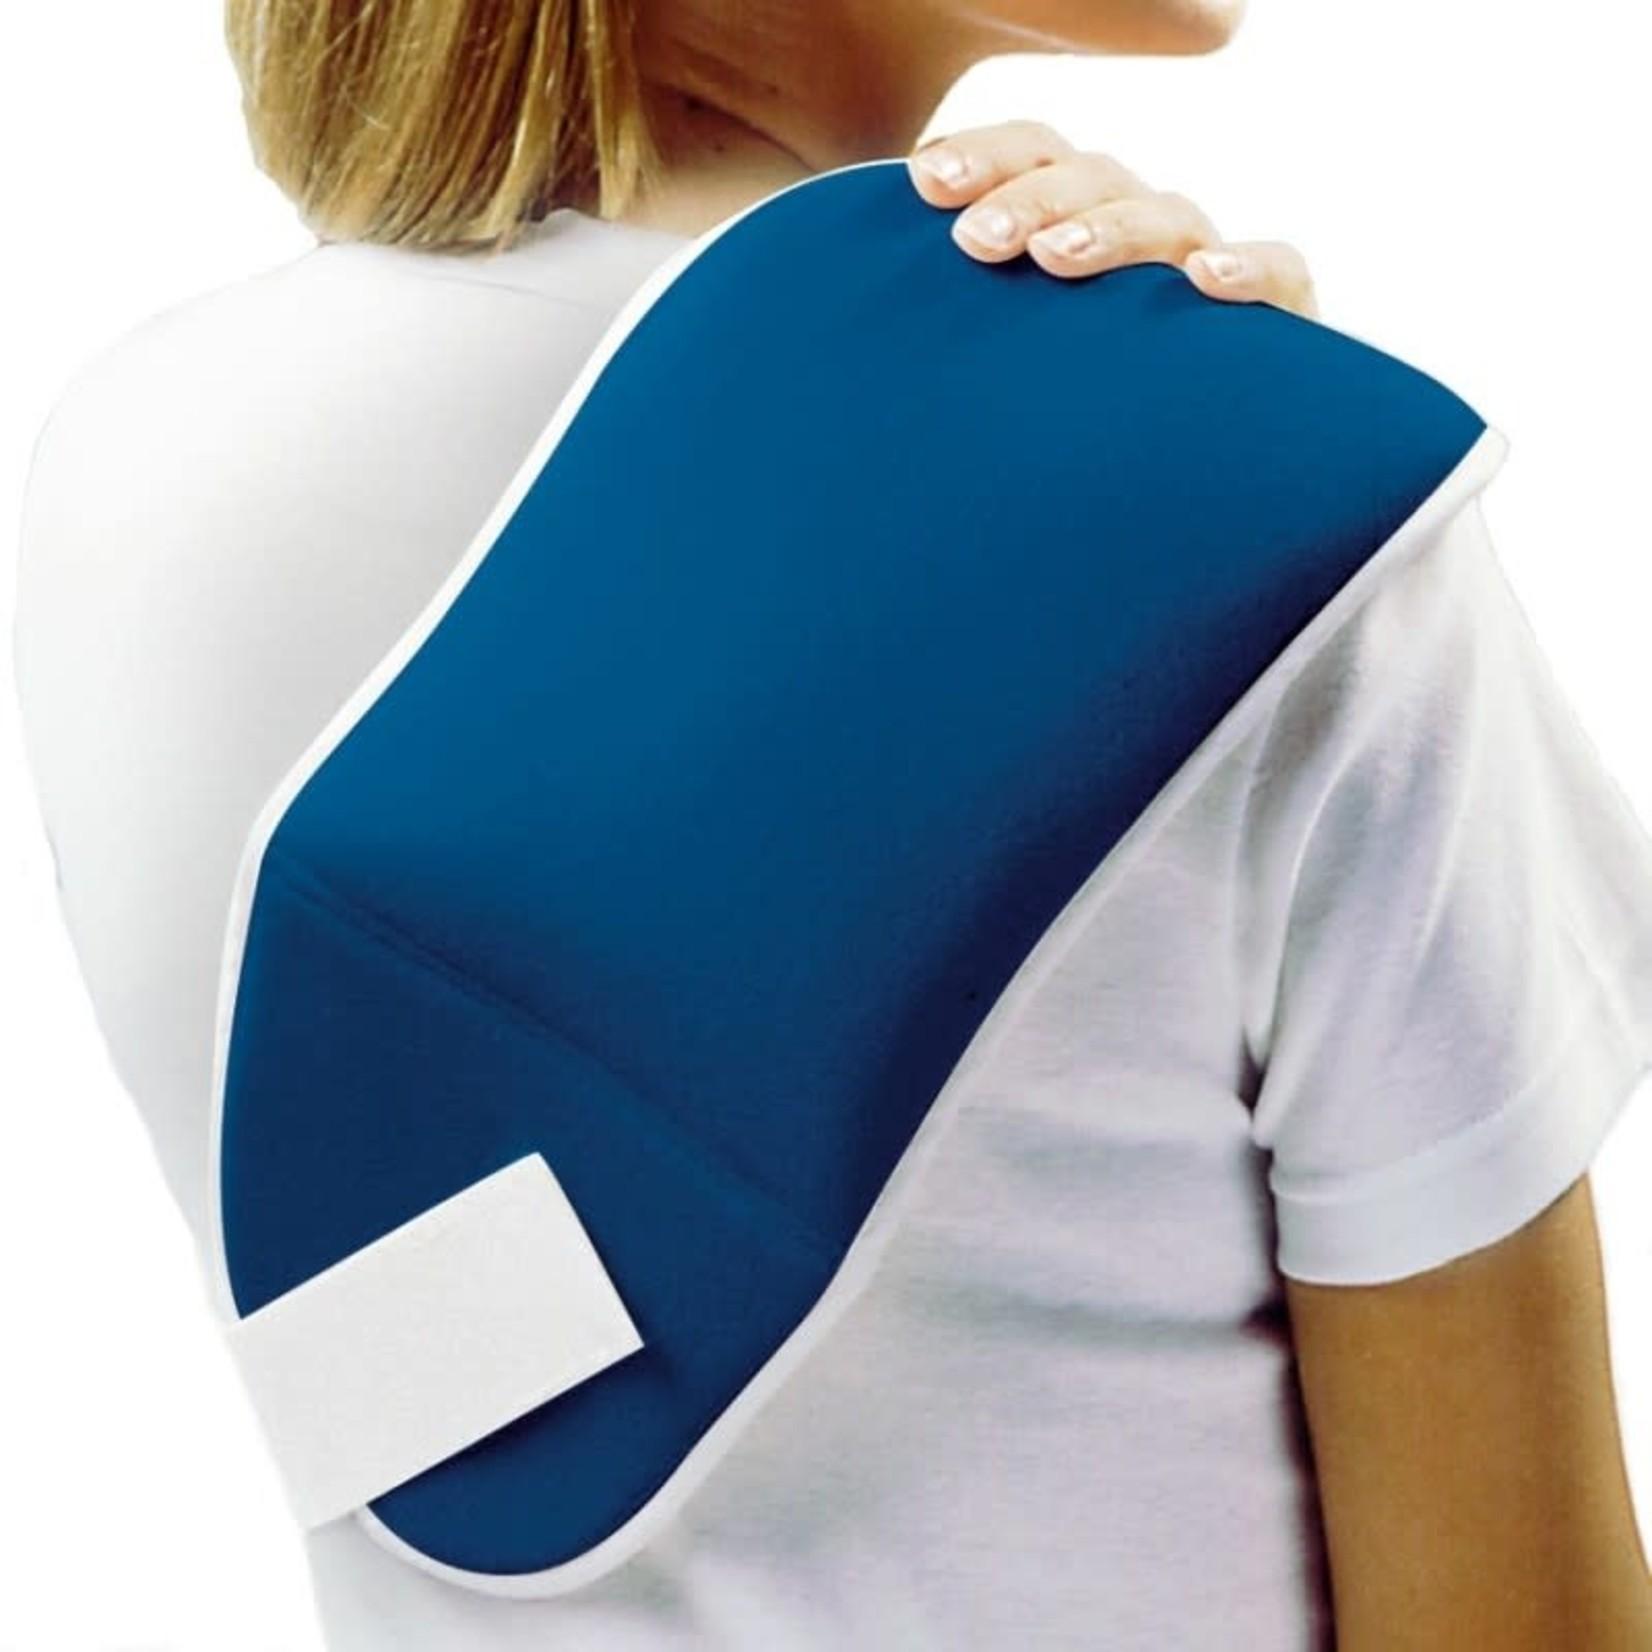 FLA Orthopedics THERMAL WRAP BACK/SHOULDER SIZE  6INX10IN BLUE UN